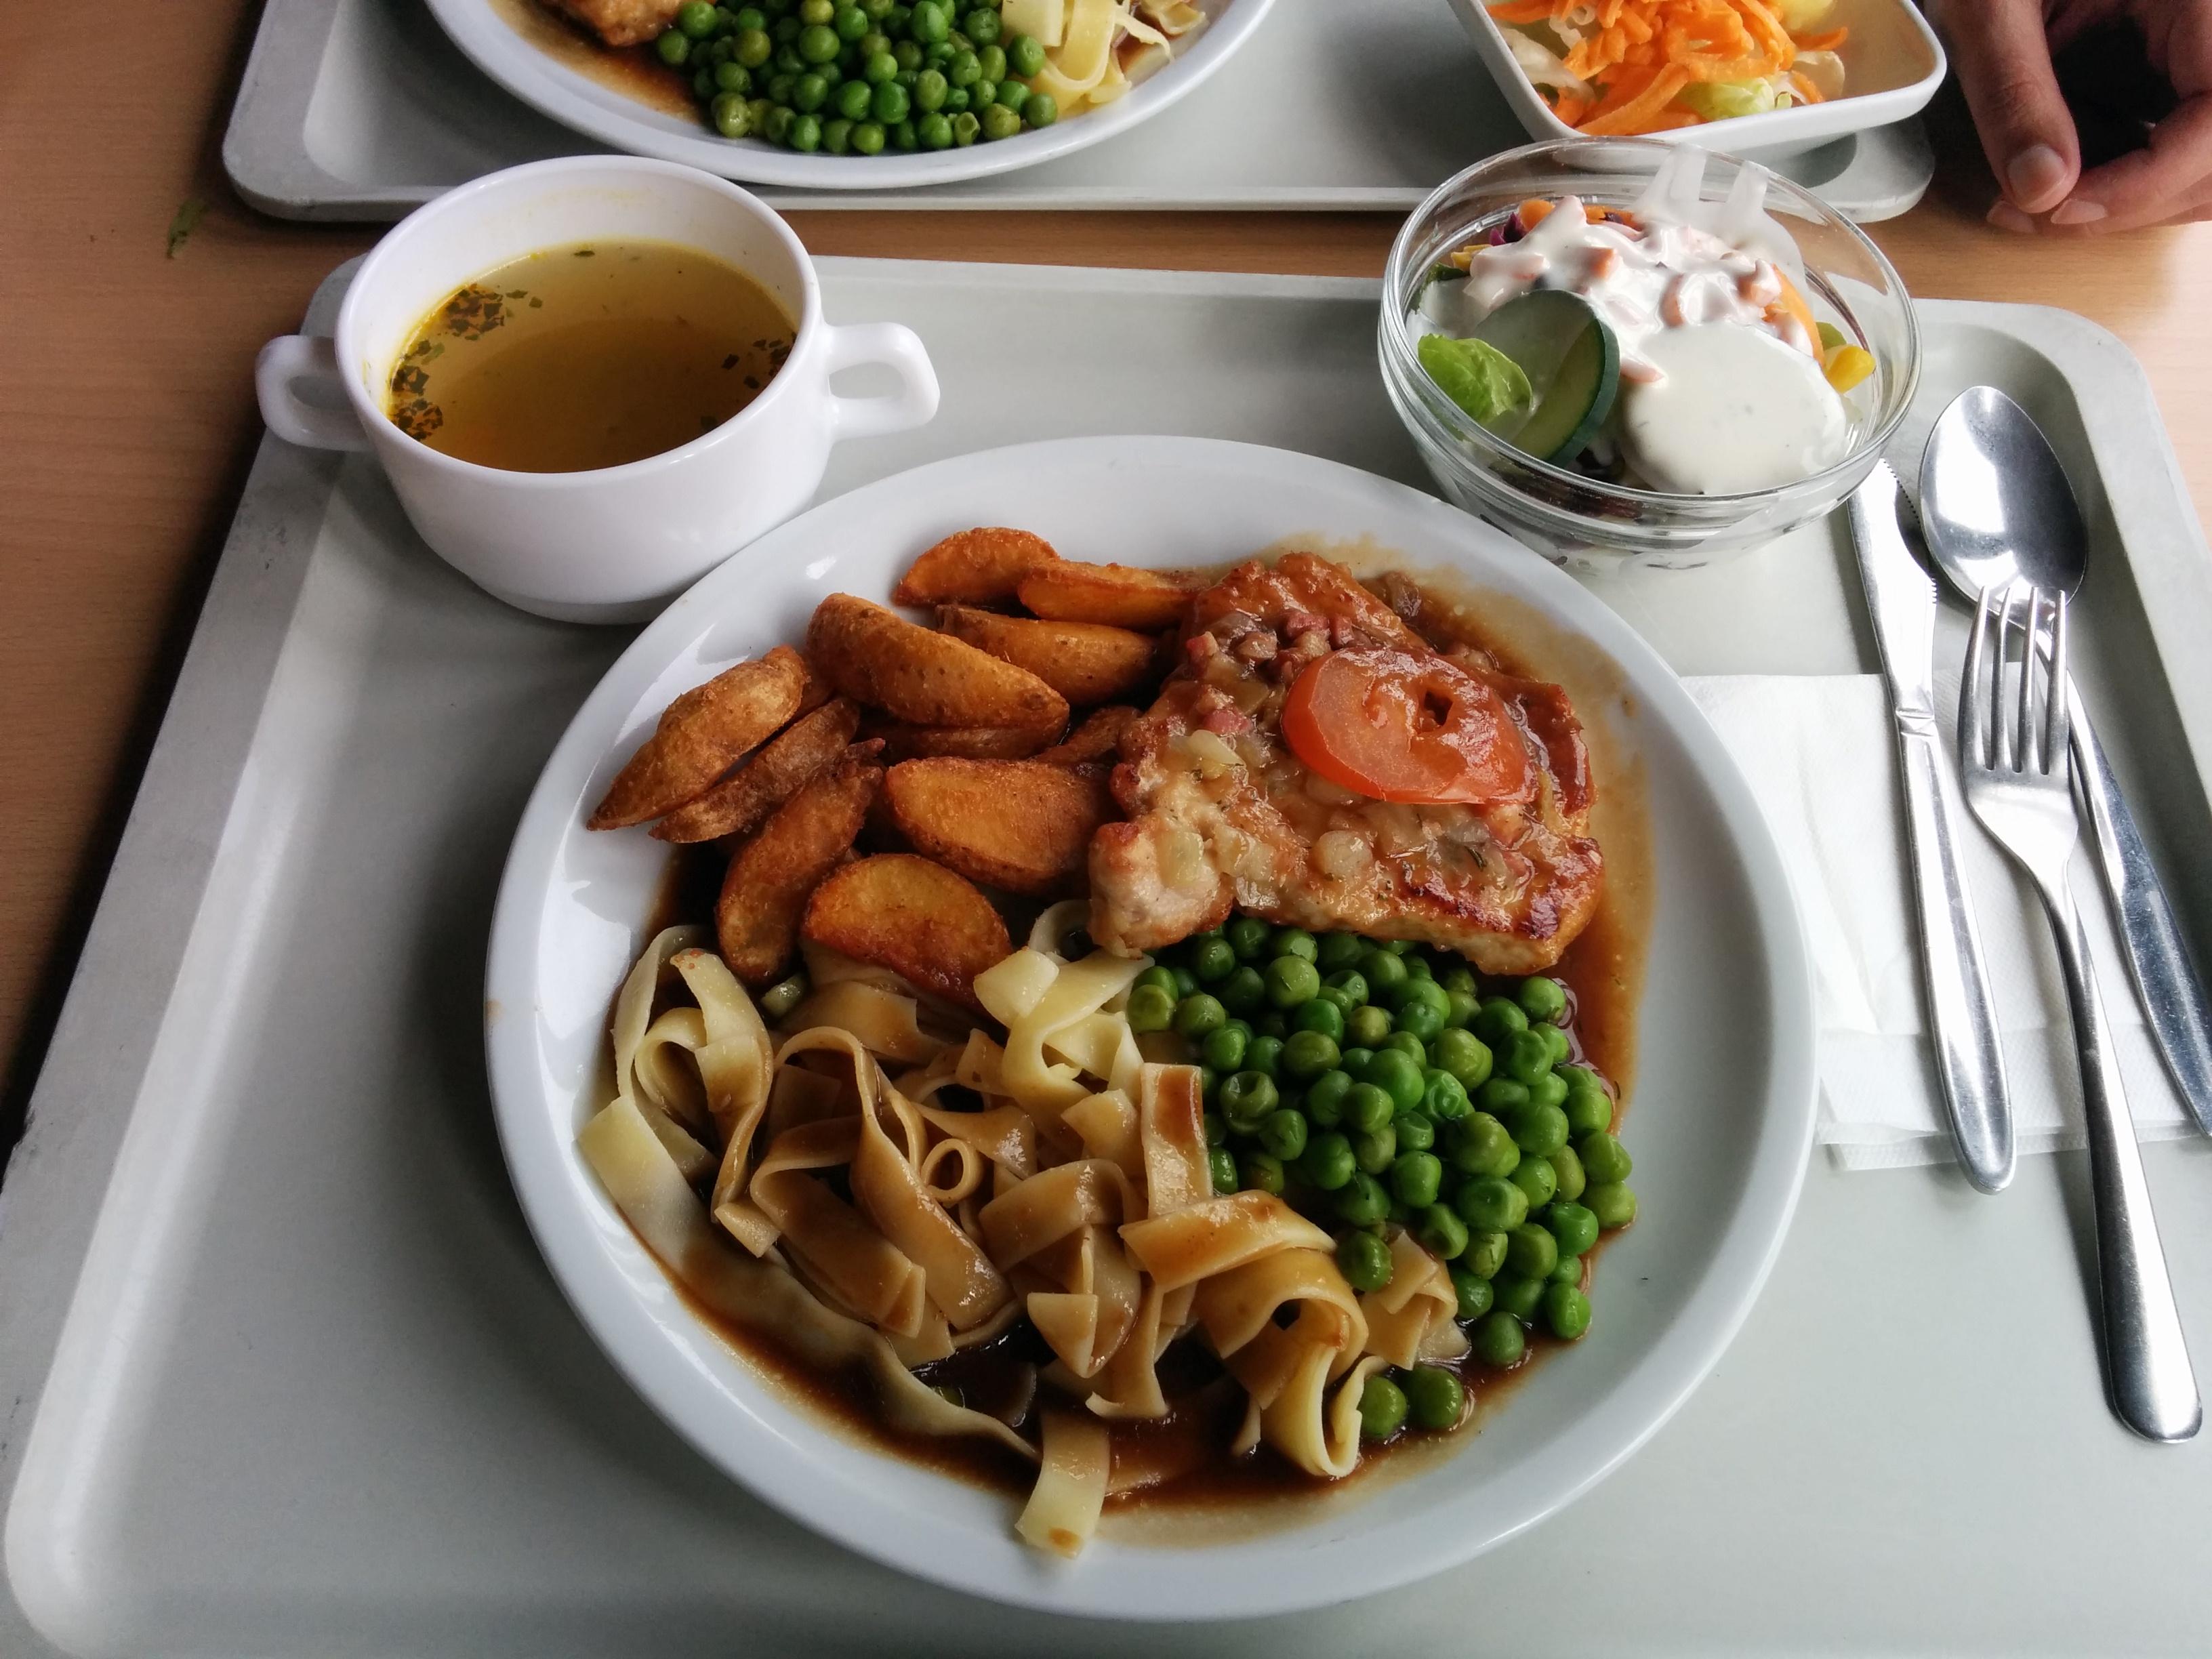 http://foodloader.net/nico_2017-07-12_schweinesteak-nudeln-kartoffelecken-erbsen-suppe-salat.jpg